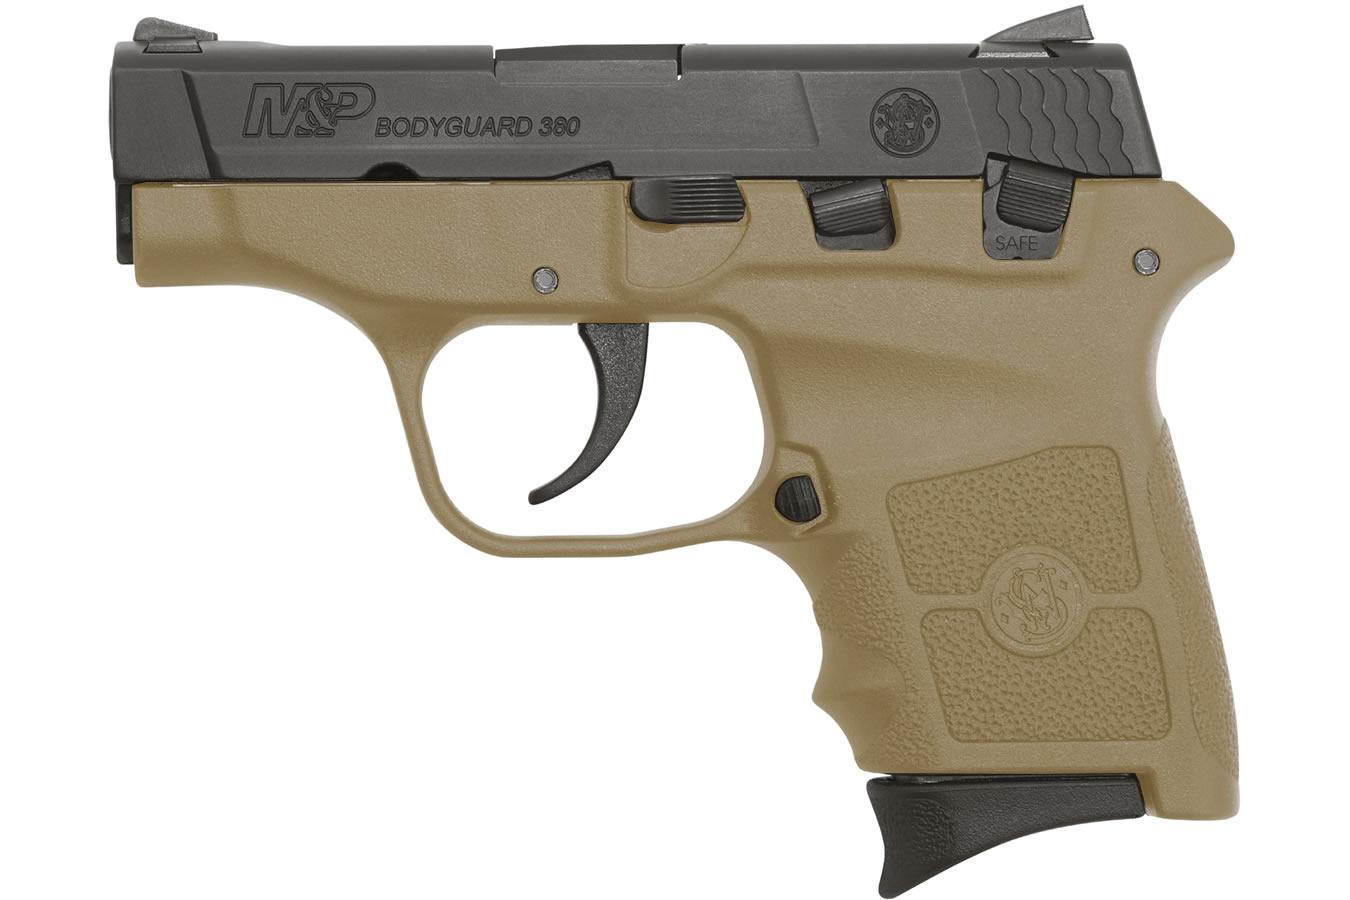 M&P Bodyguard 380 Flat Dark Earth (FDE) Carry Conceal Pistol